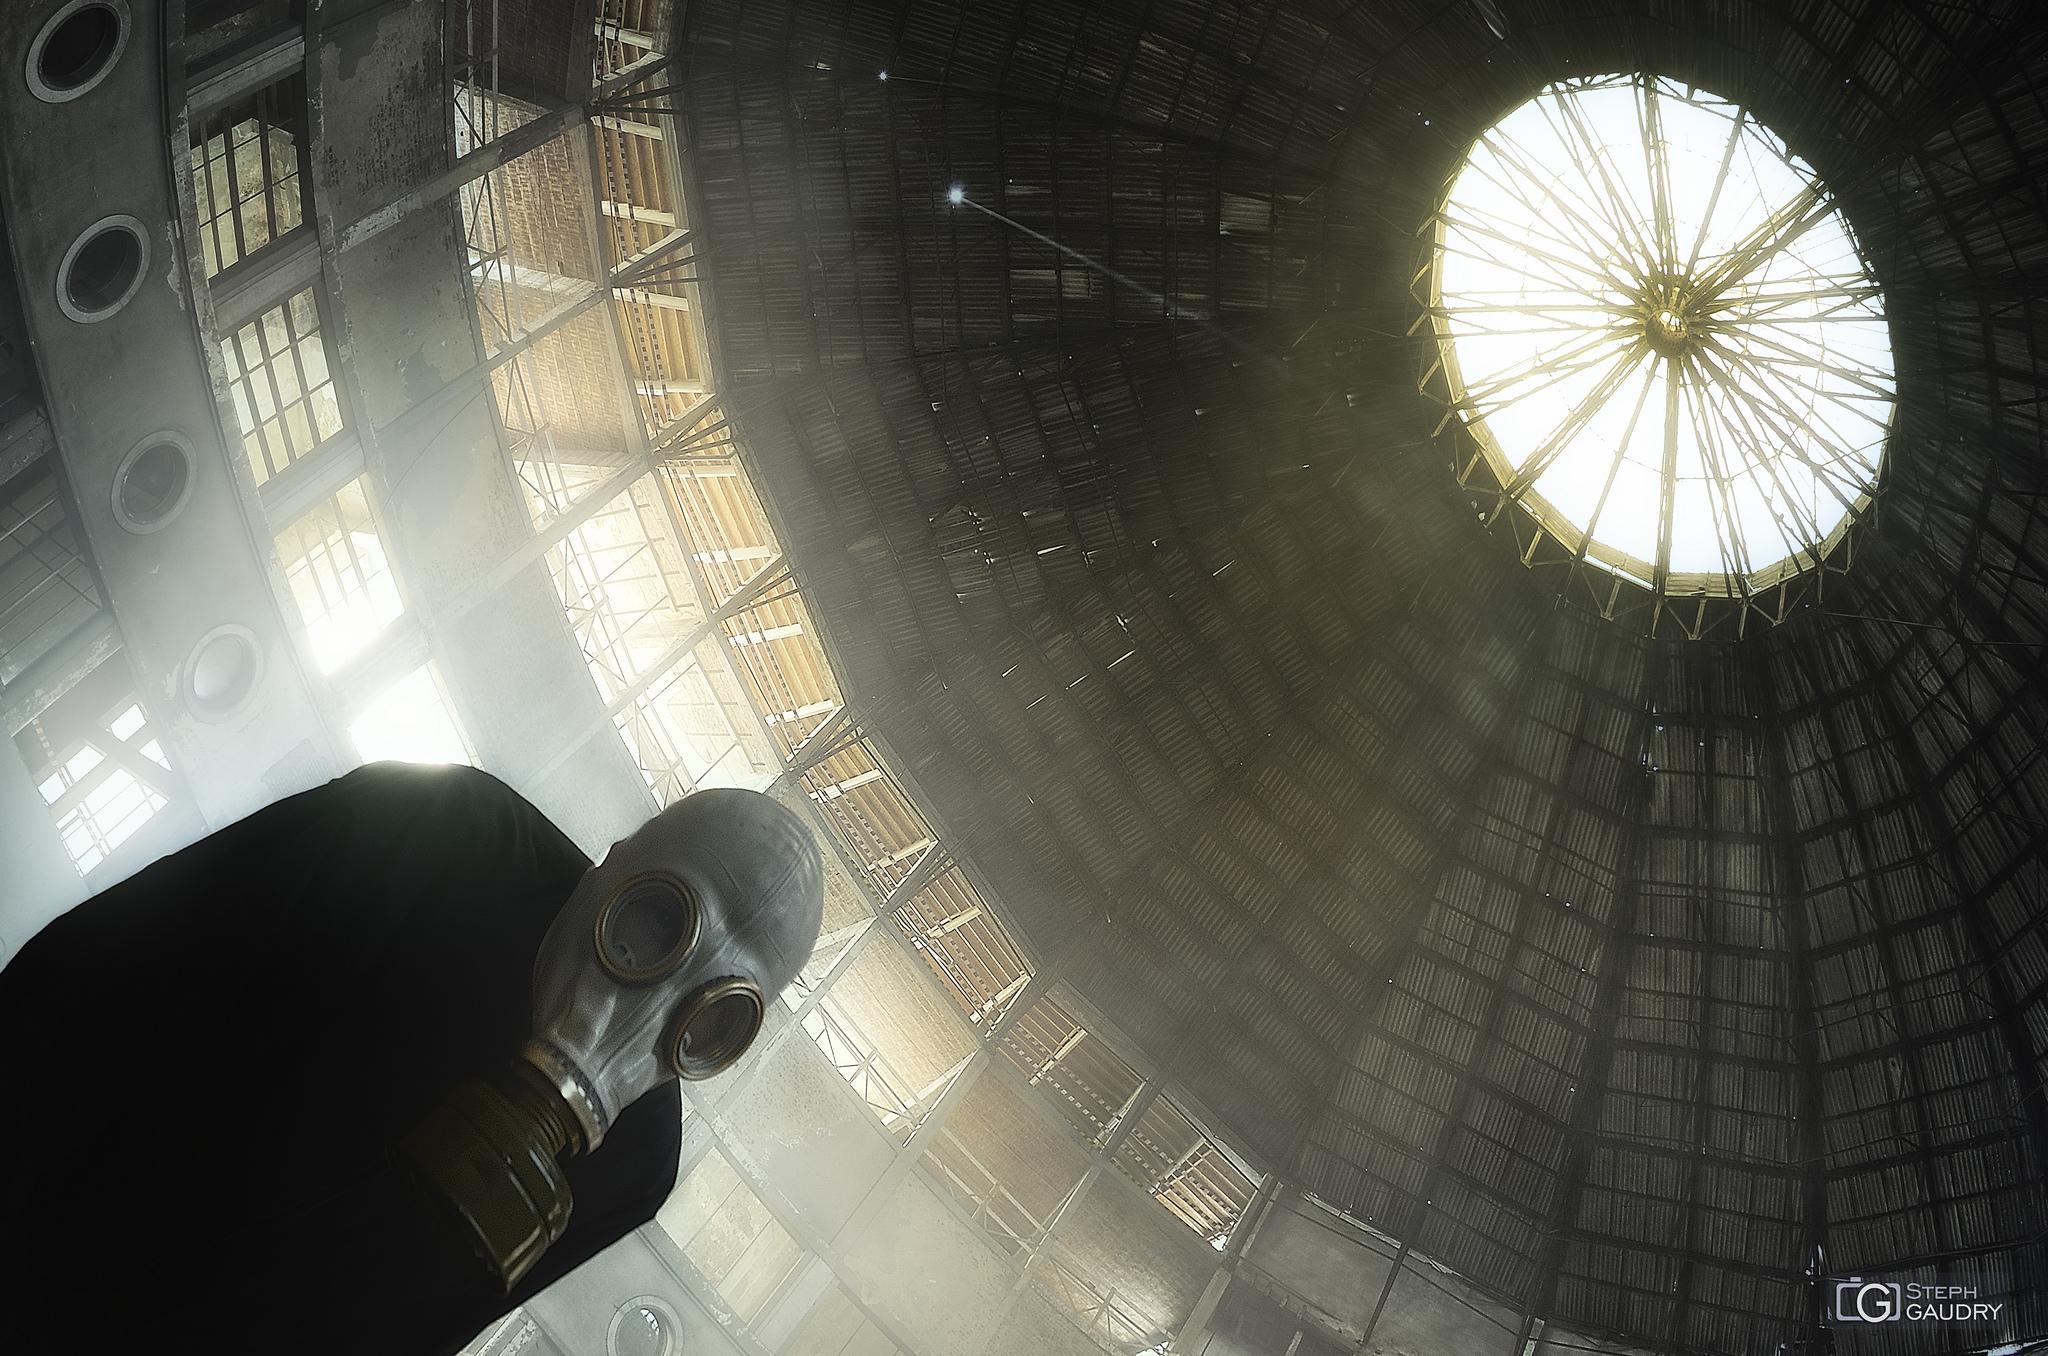 Fallout Circus [Click to start slideshow]